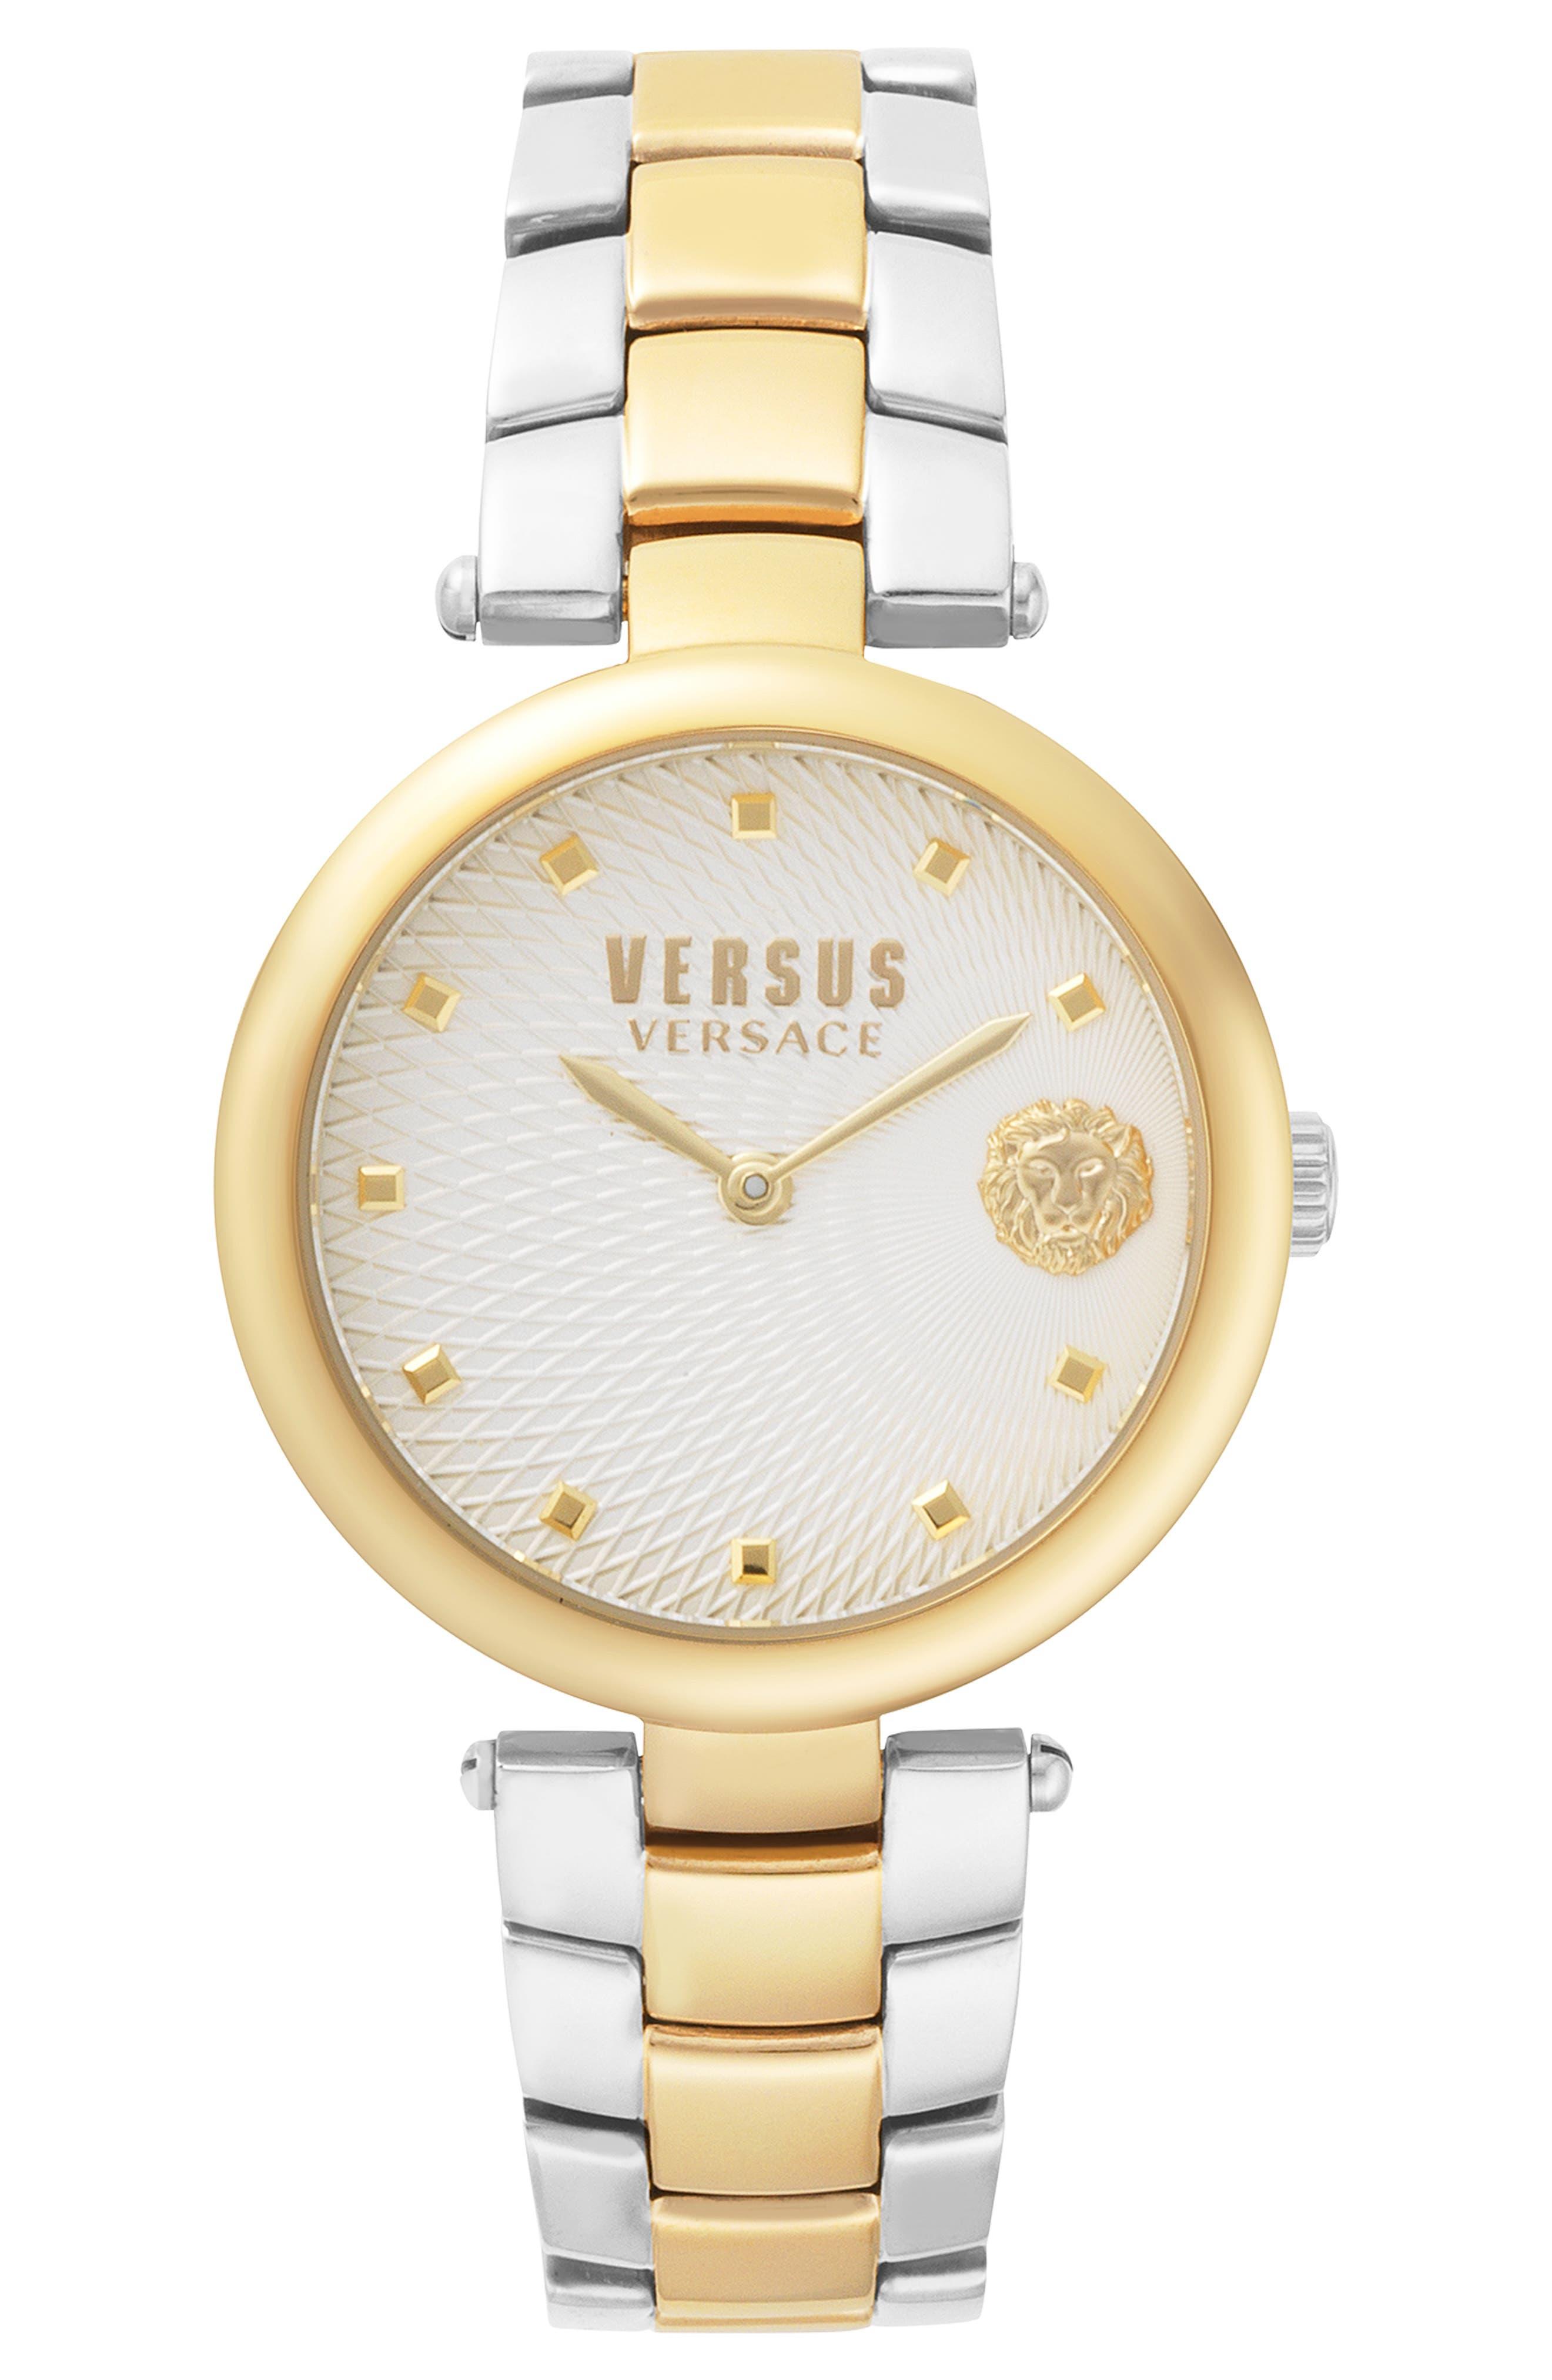 VERSUS VERSACE, Buffle Bay Bracelet Watch, 36mm, Main thumbnail 1, color, SILVER/ GOLD